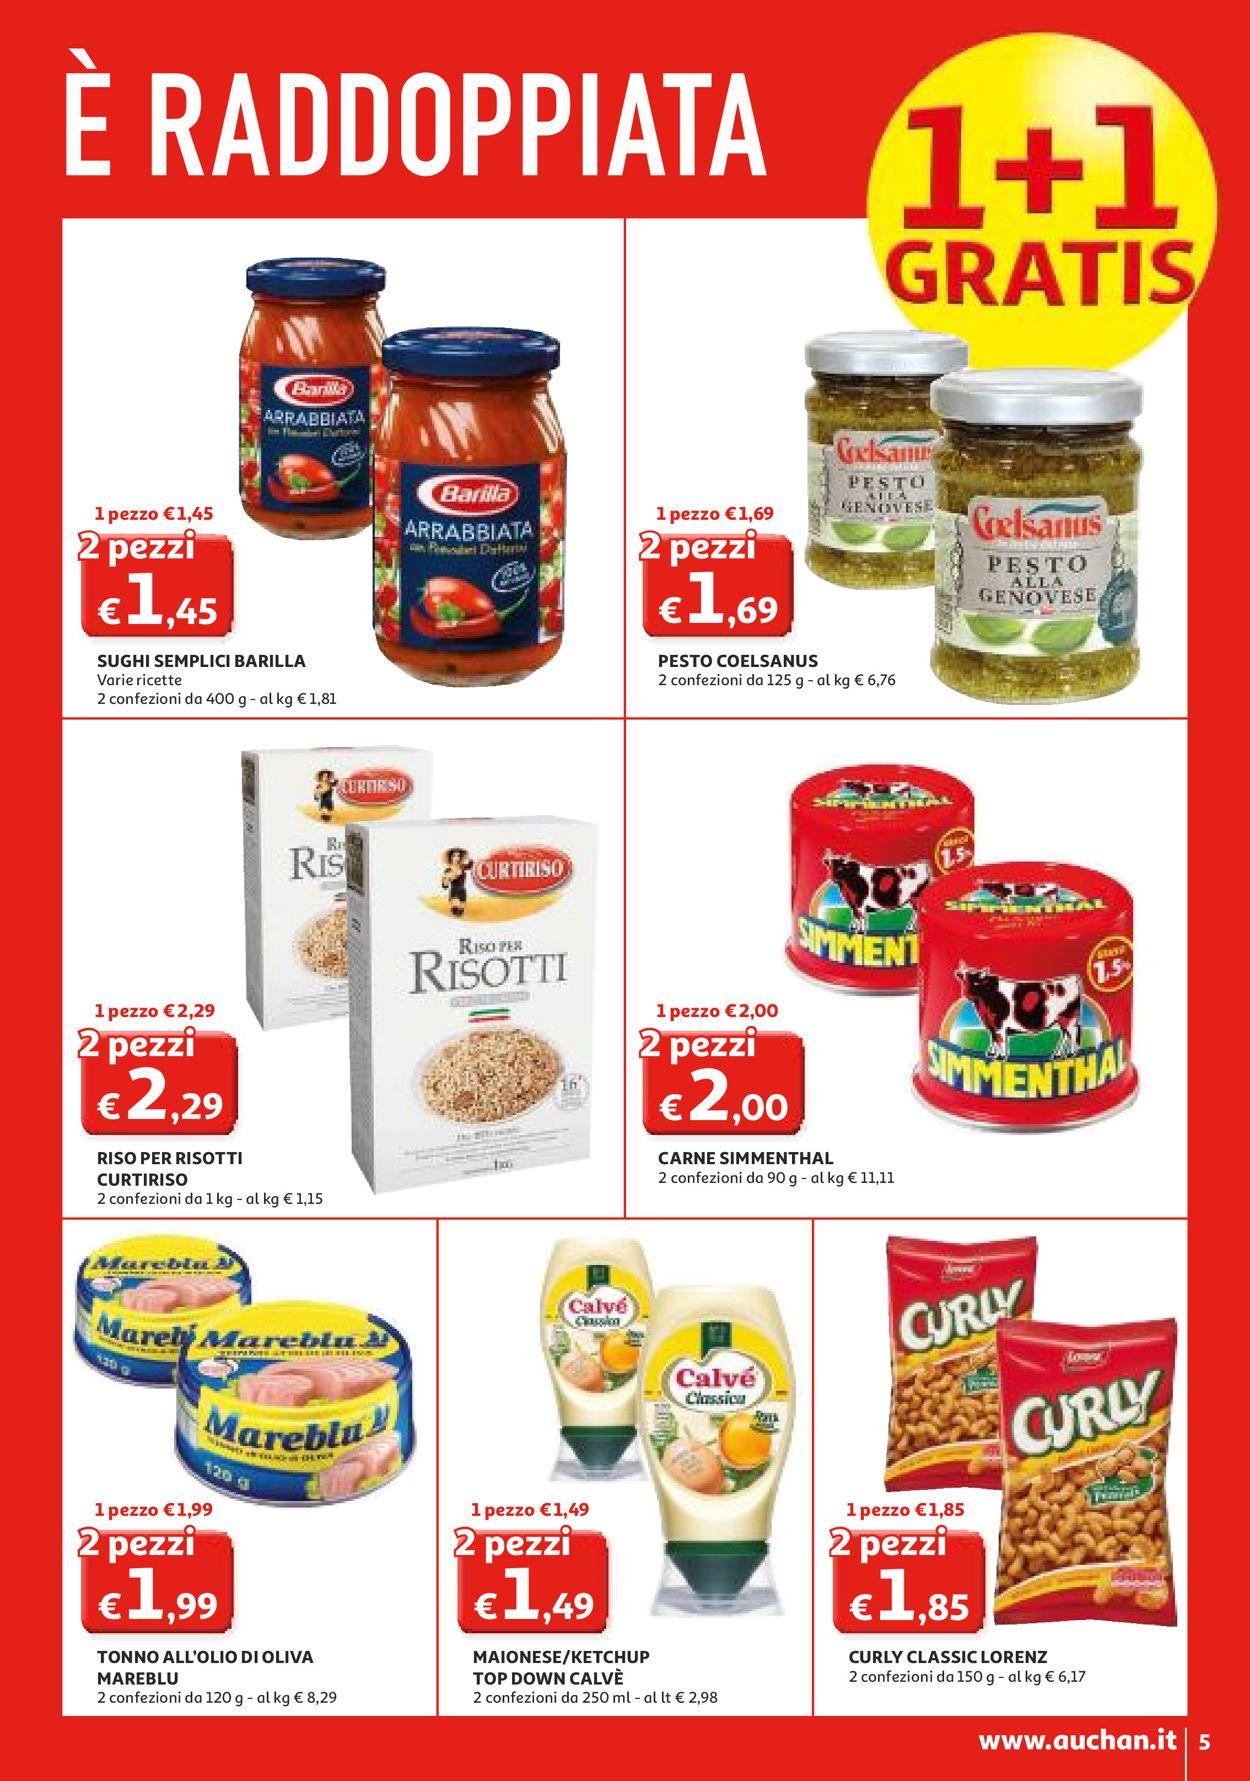 Volantino Auchan - Offerte 27/02-08/03/2020 (Pagina 5)